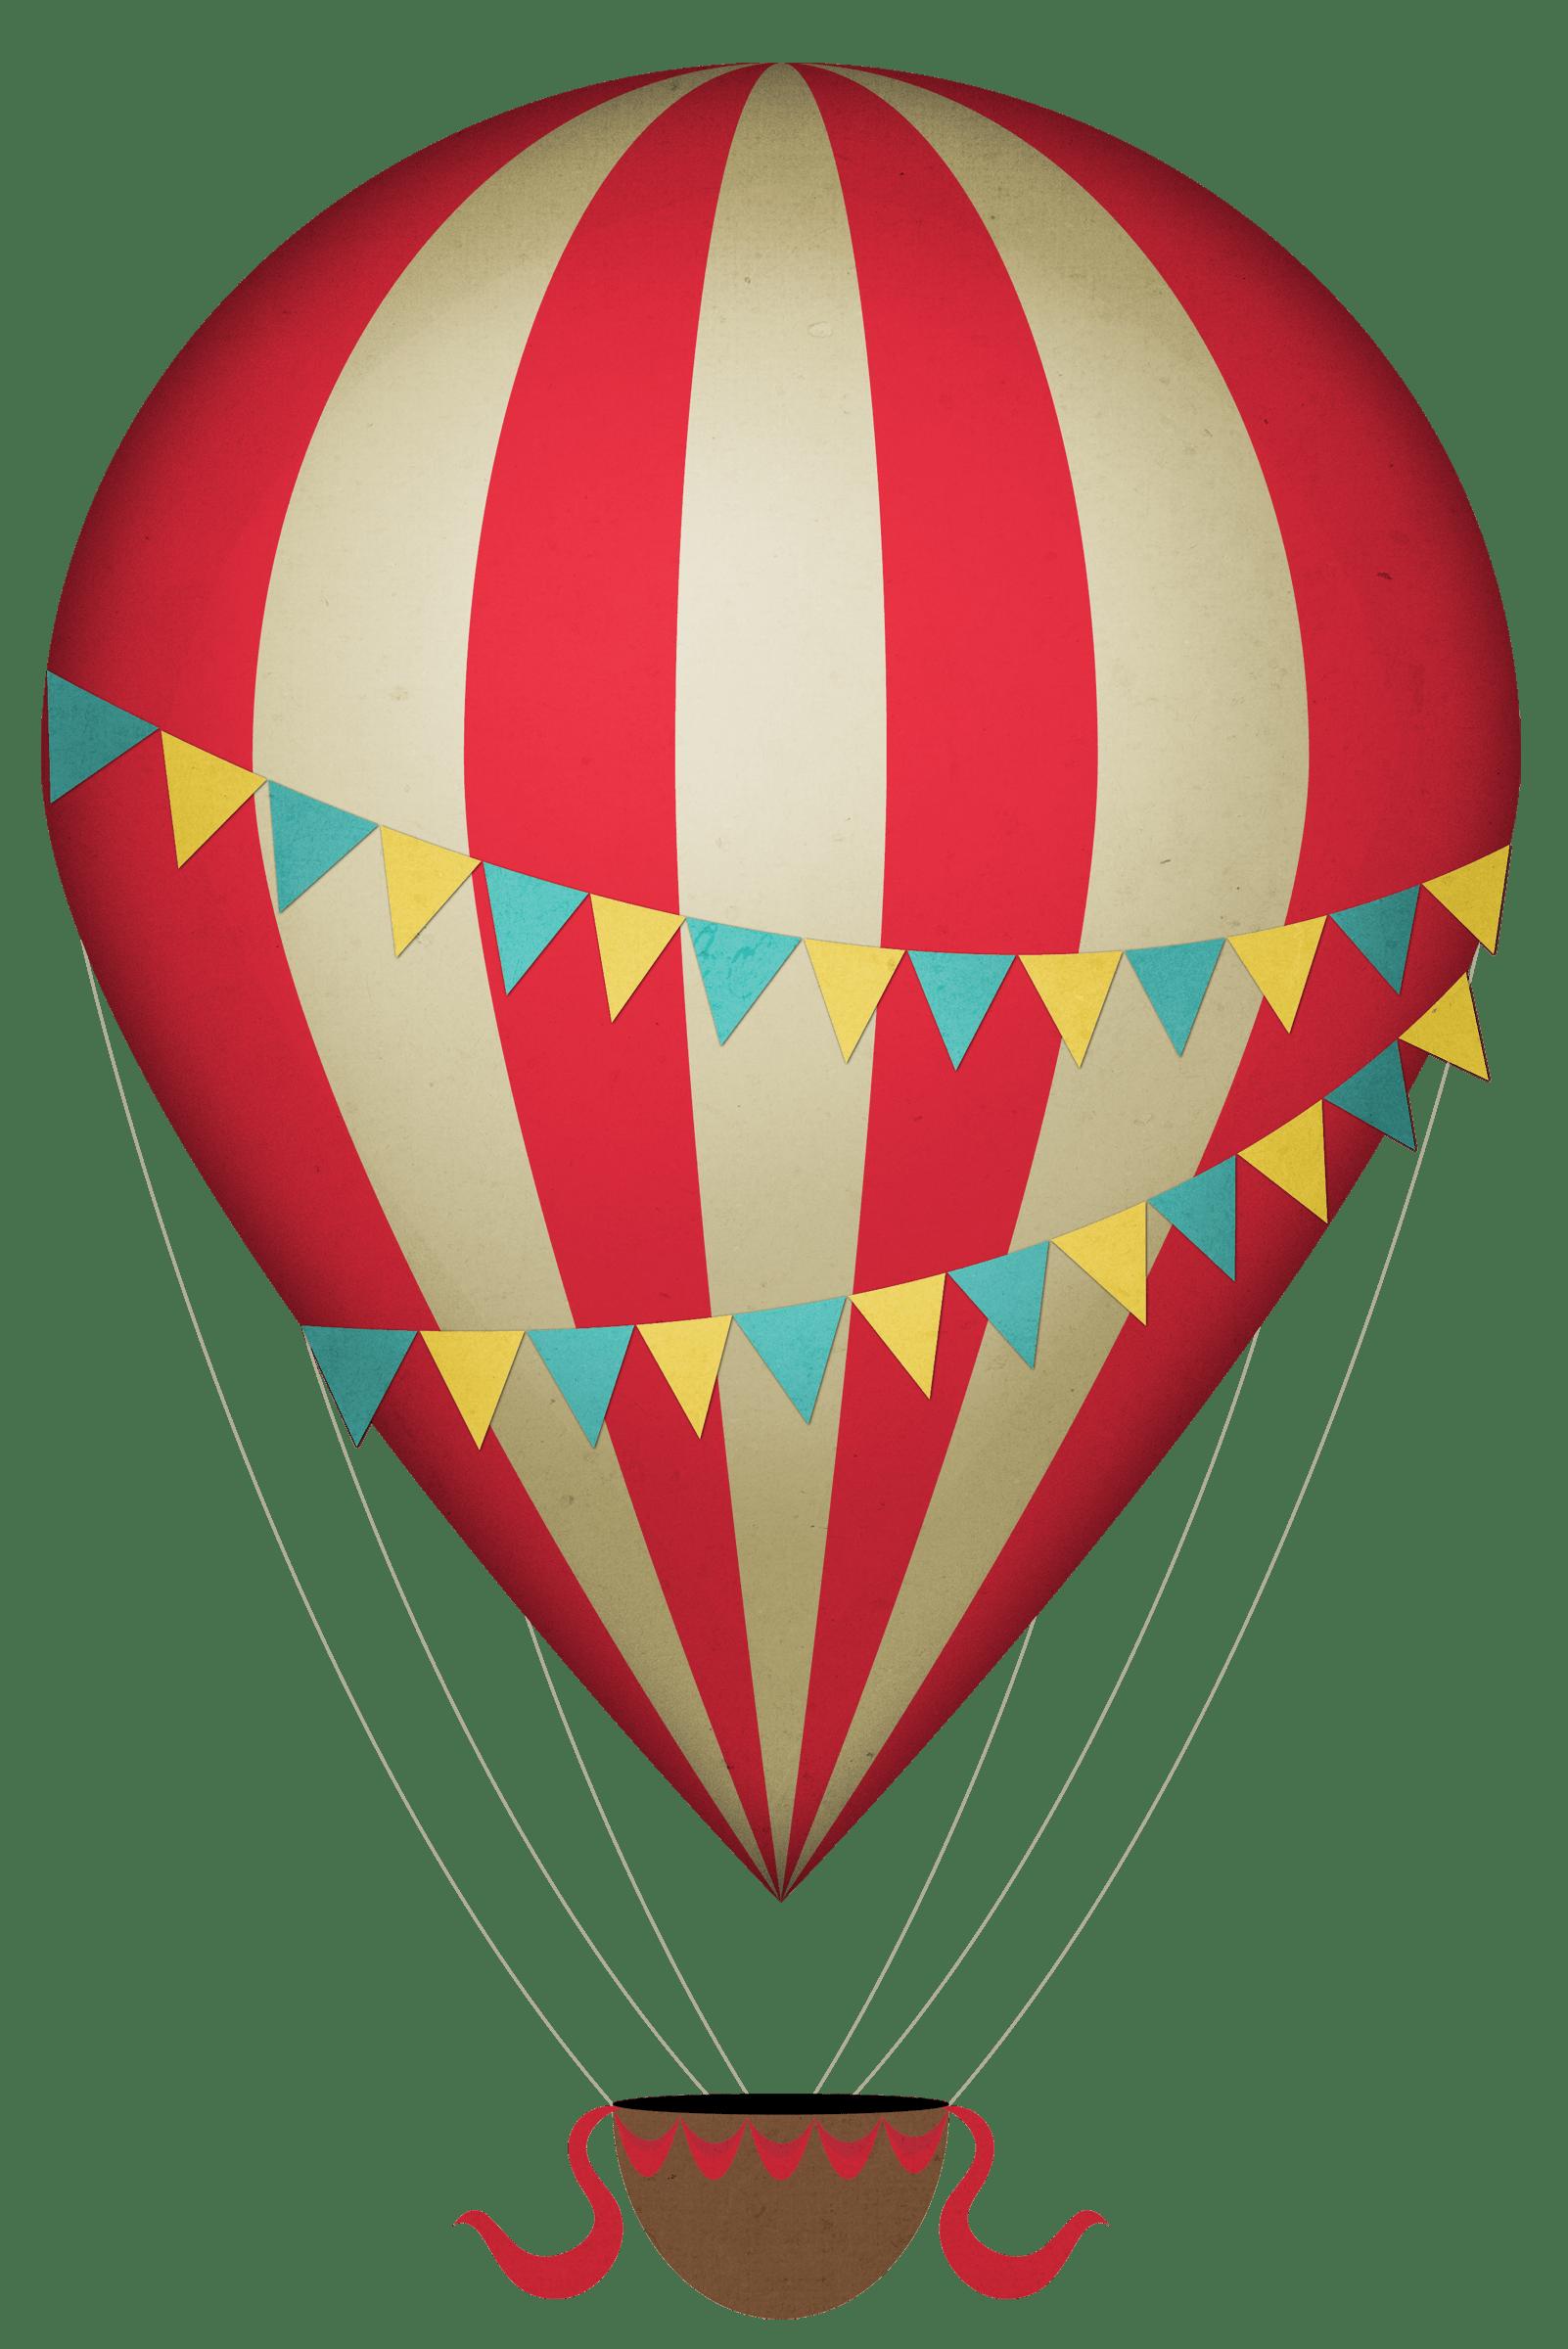 Vintage Clipart Hot Air Balloon transparent PNG.